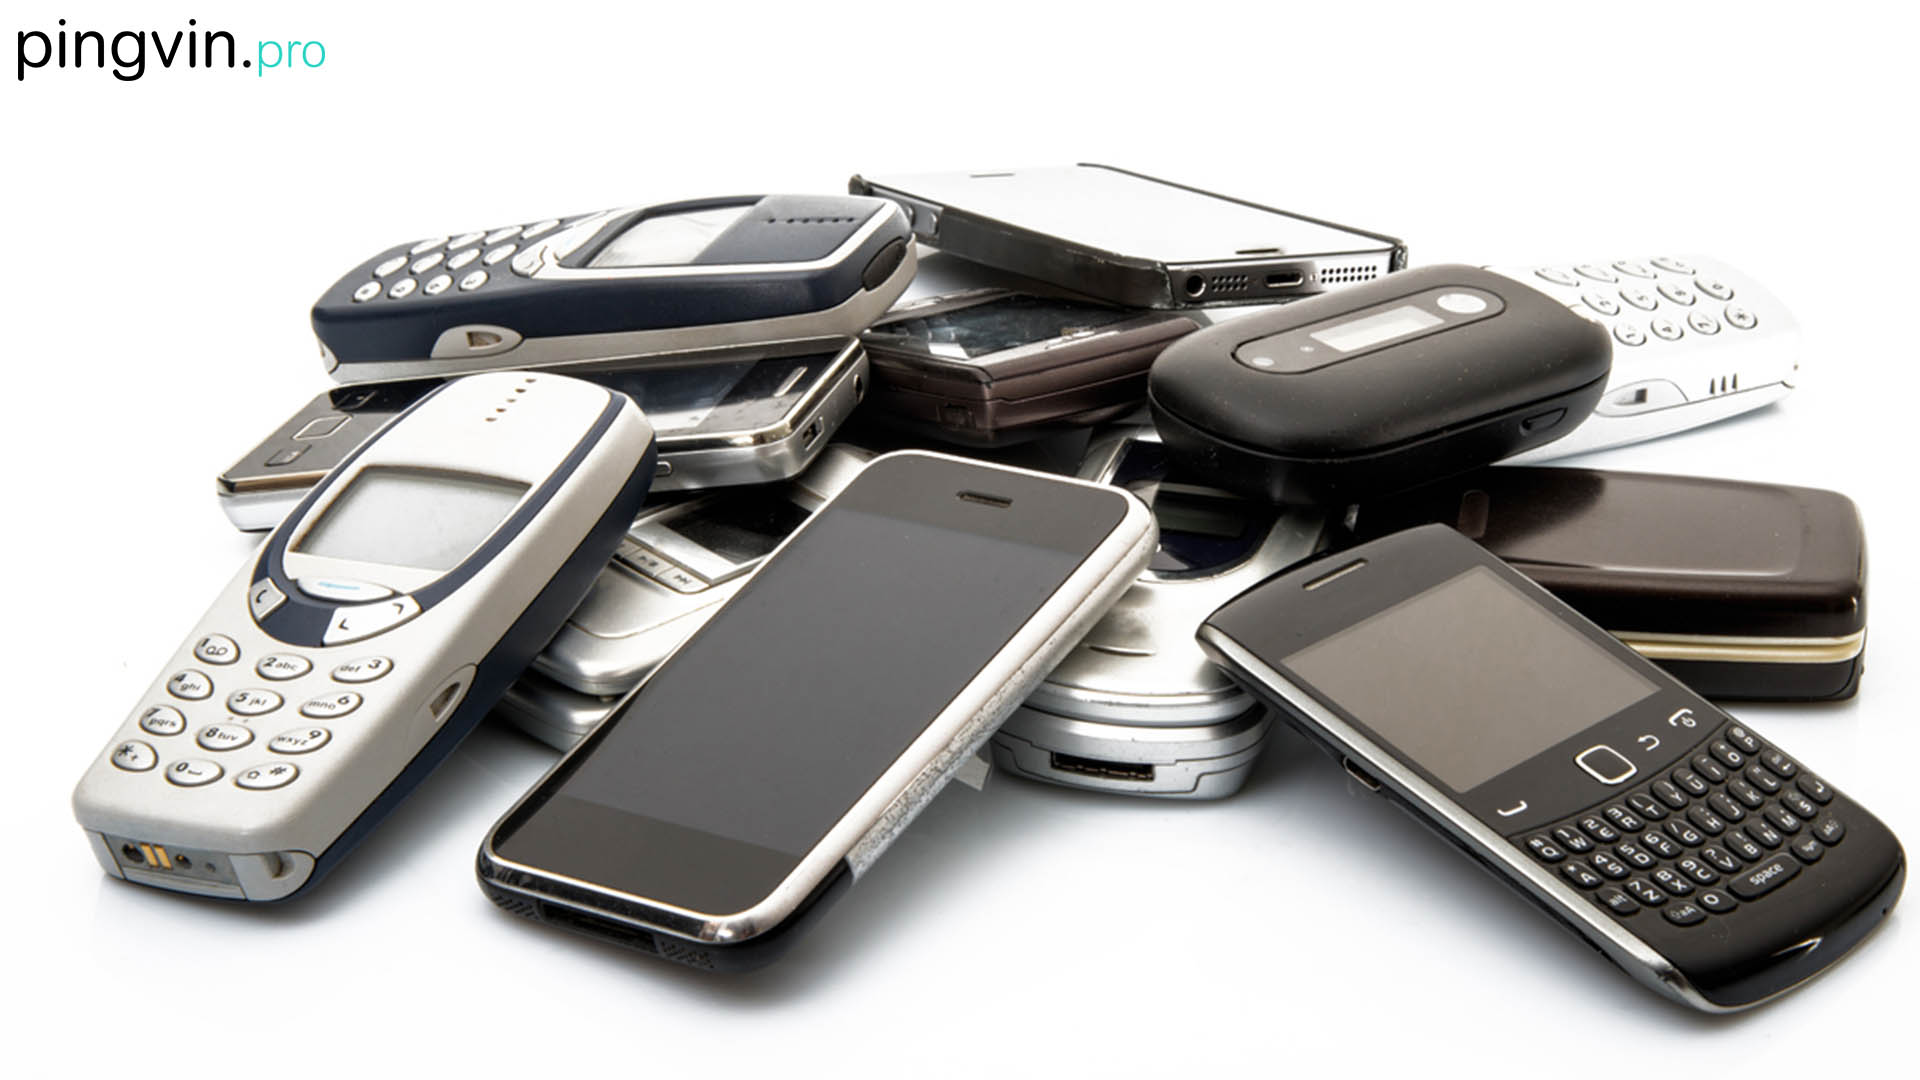 телефони з 2G/3G